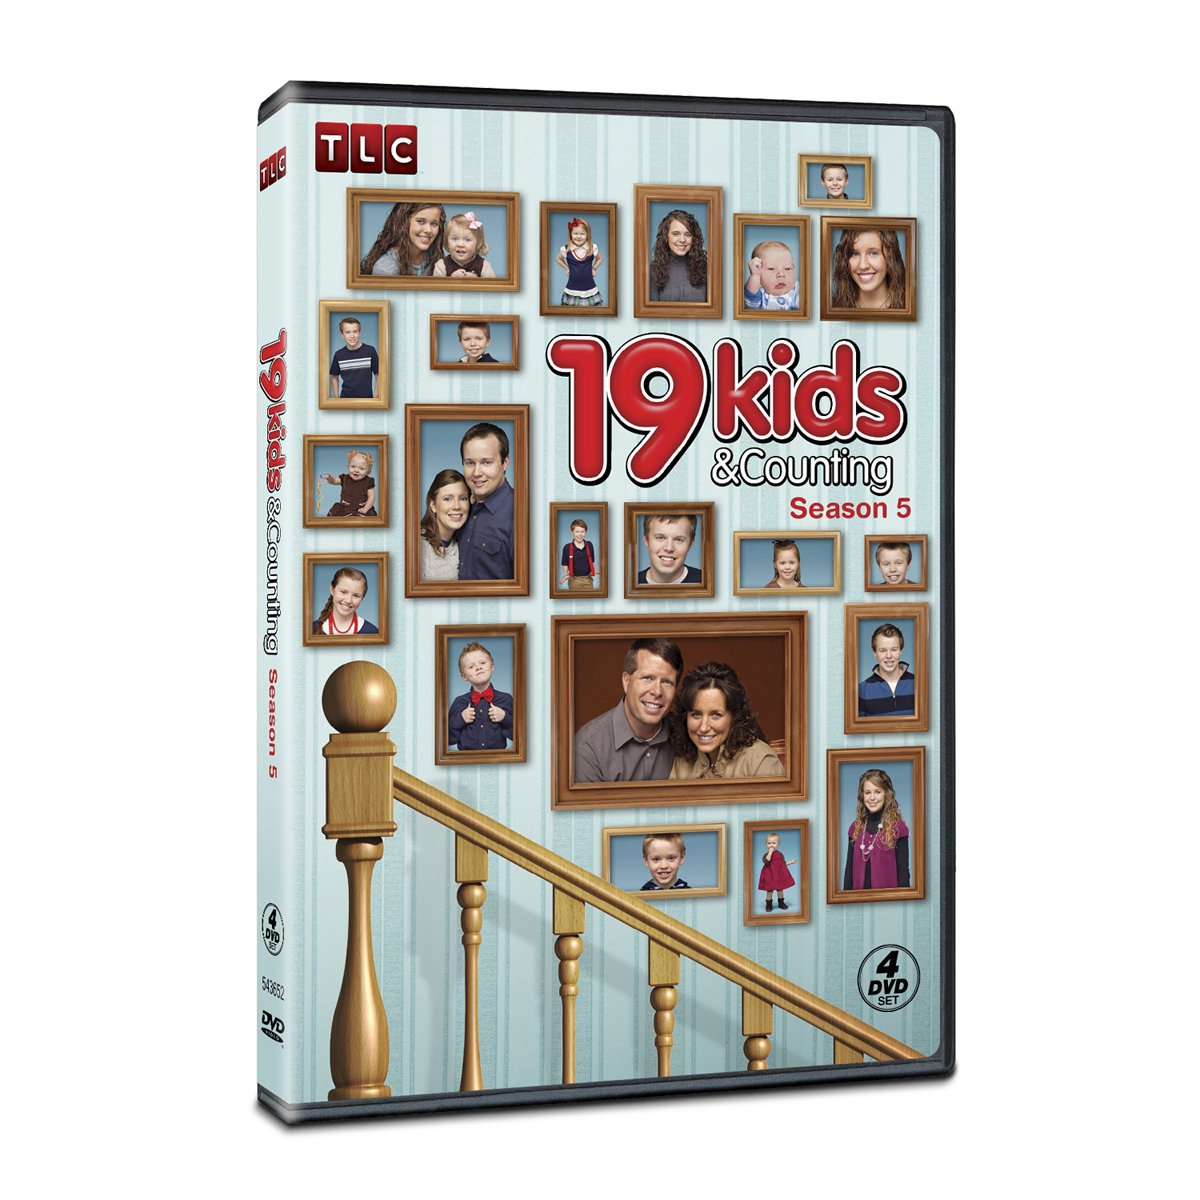 19 Kids & Counting Season 5